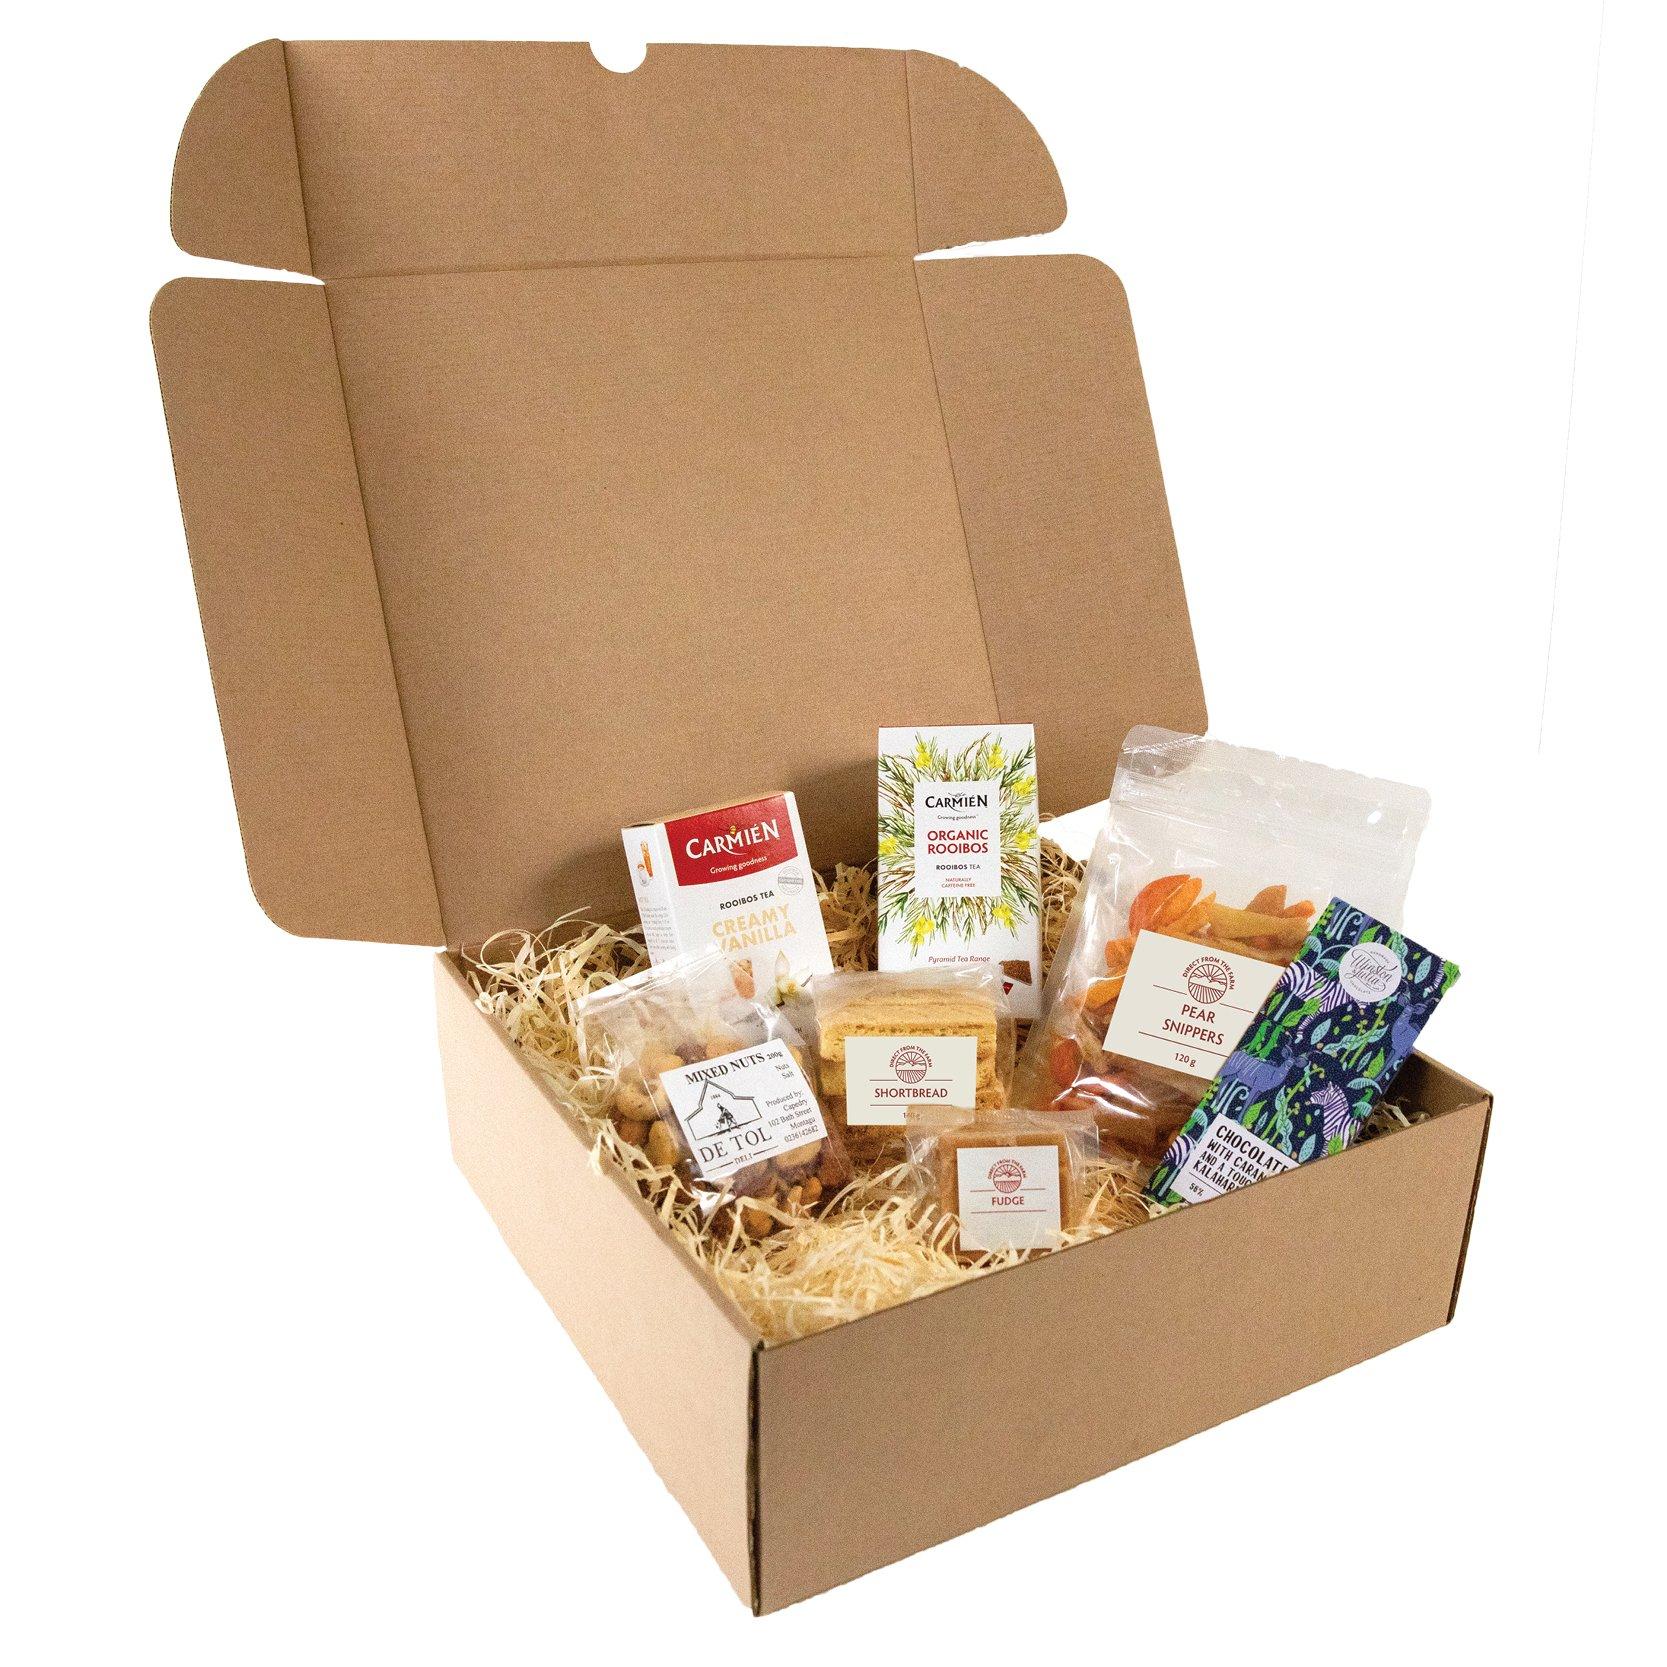 carmien-tea-snack-lovers-gift-box